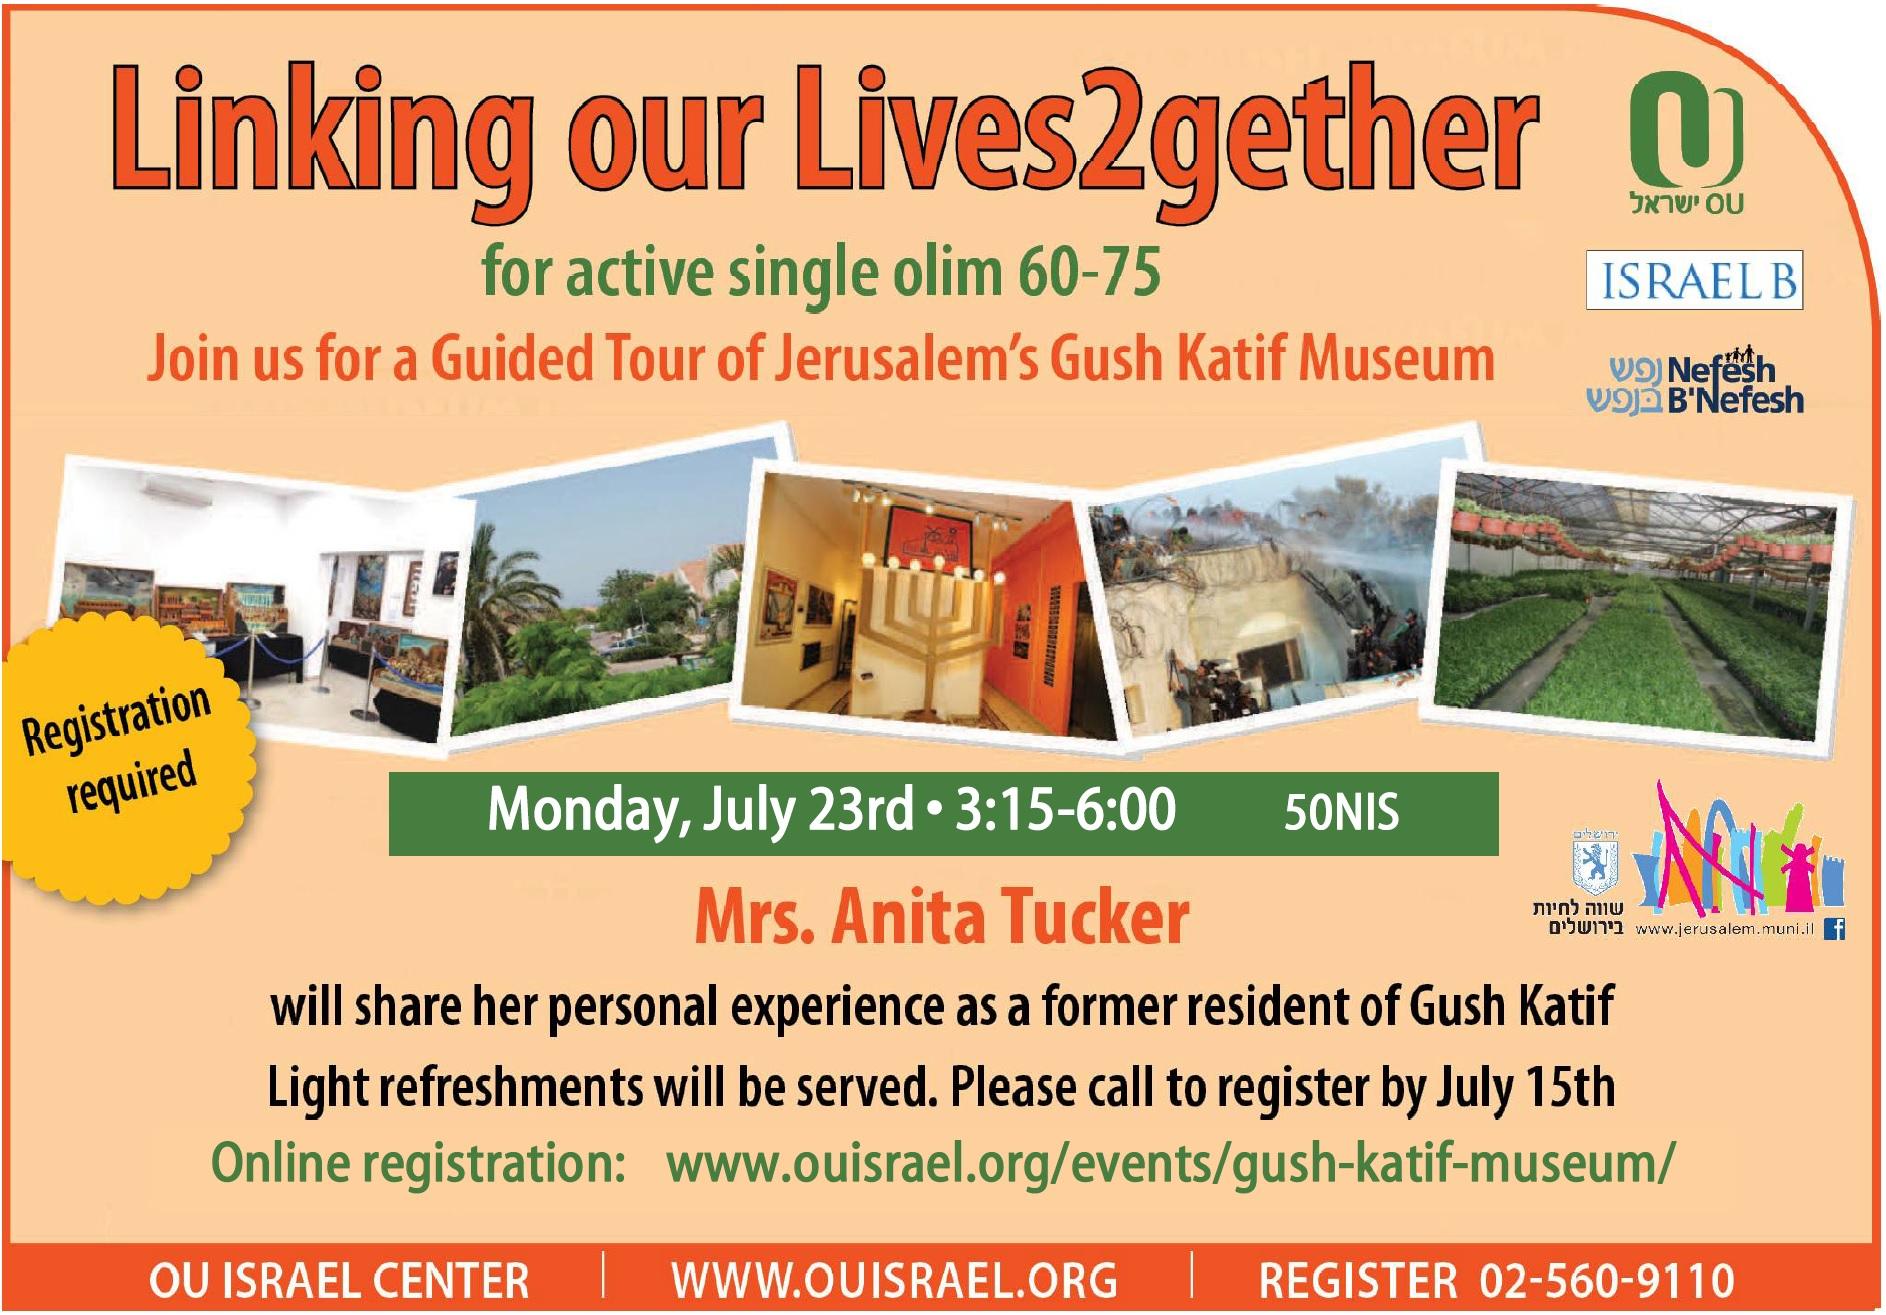 Gush Katif Museum Tour (for single olim 60-75)